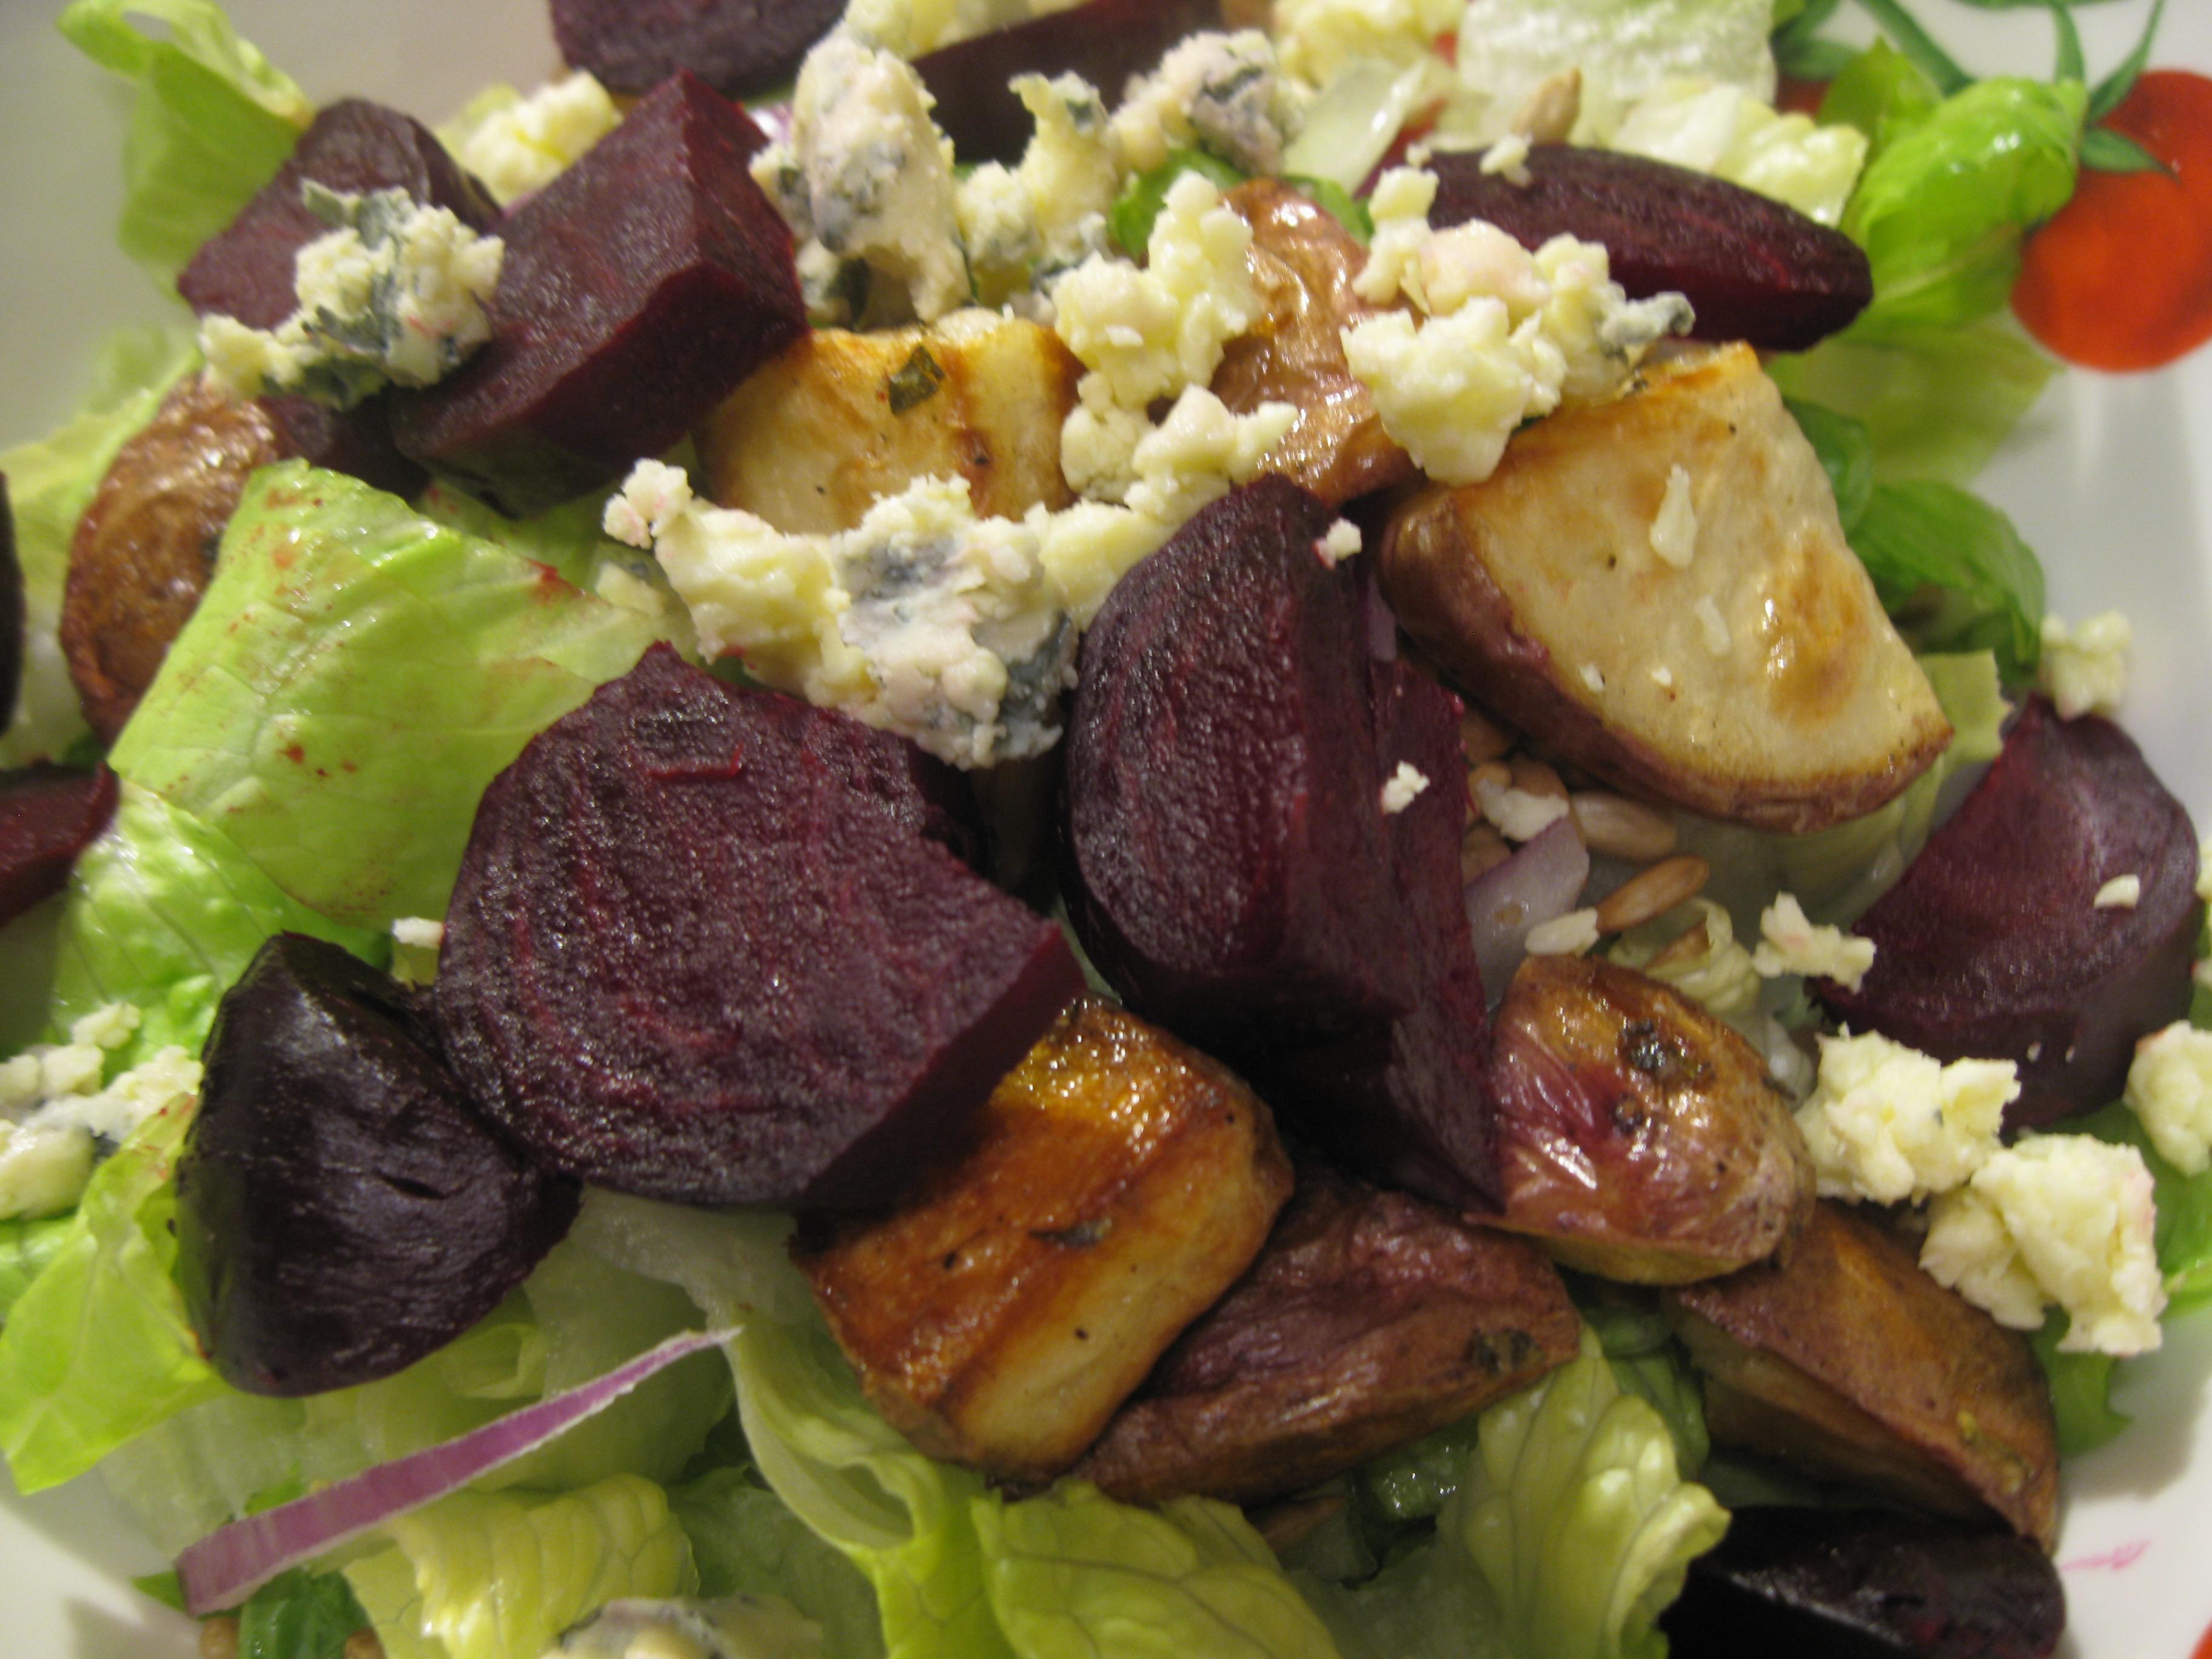 Recipe 19.1: Hearty Winter Salad